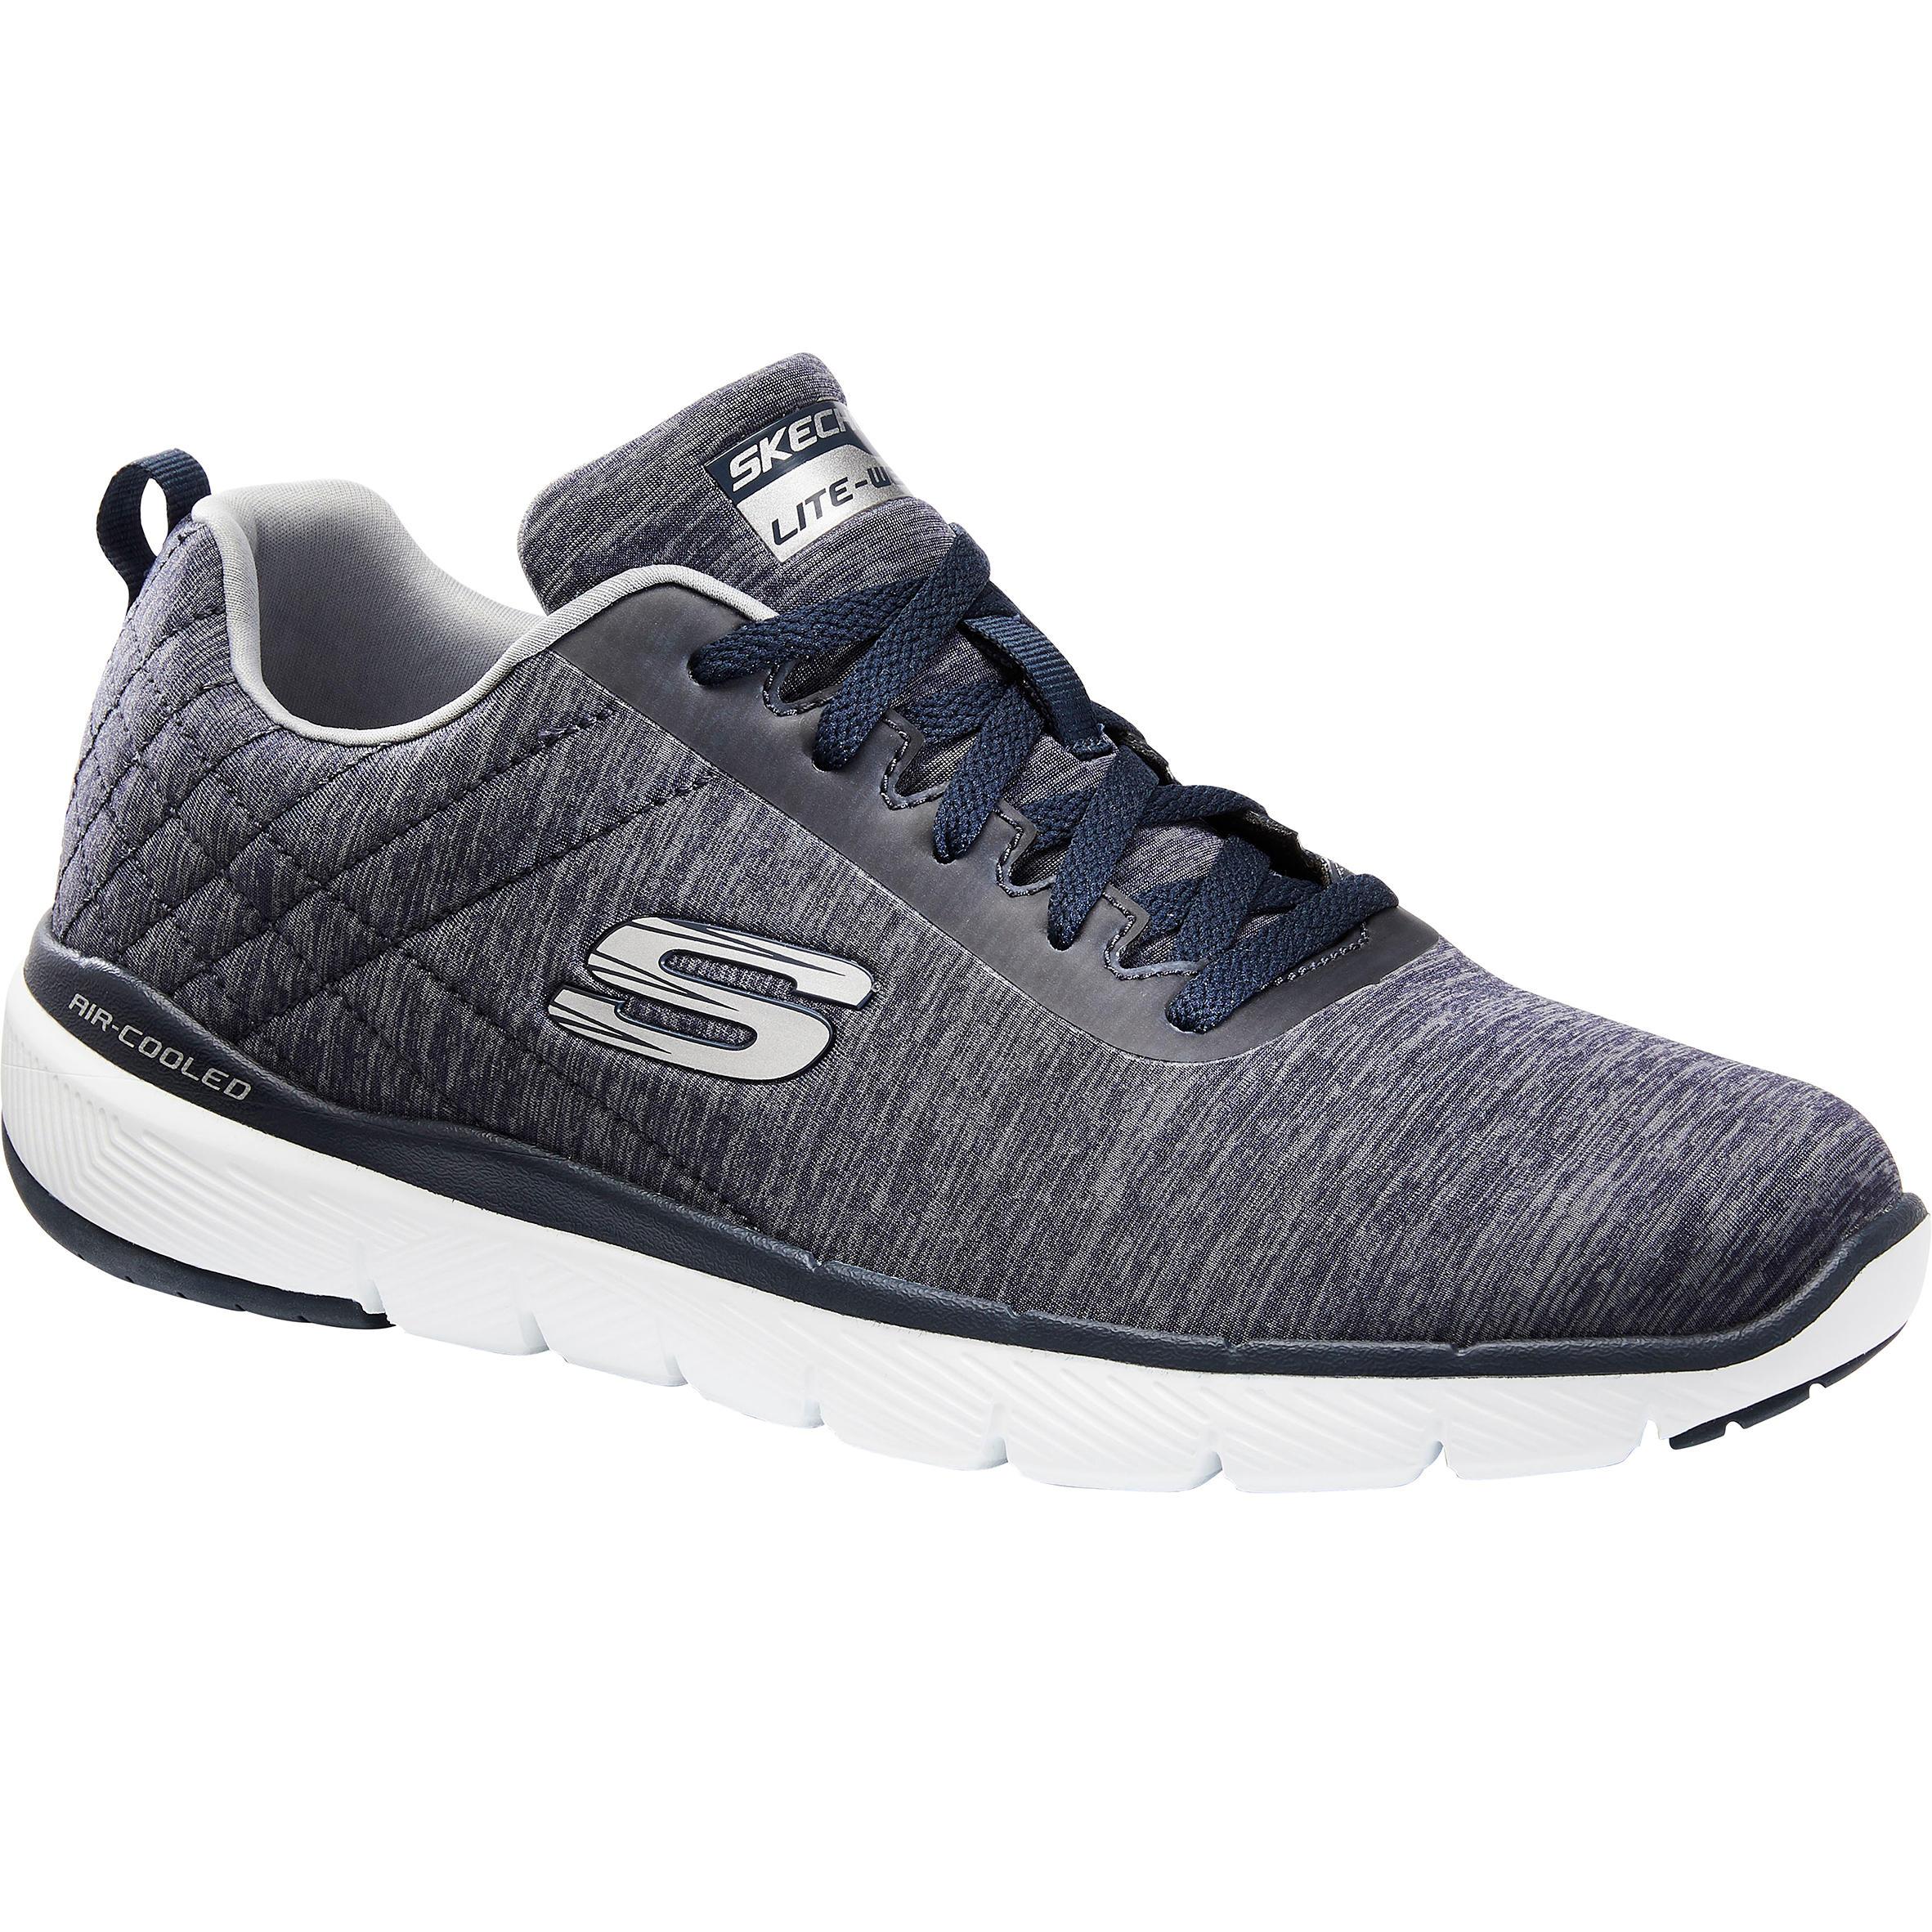 7a6c82841b Comprar Zapatillas de Caminar para Hombre Online | Decathlon